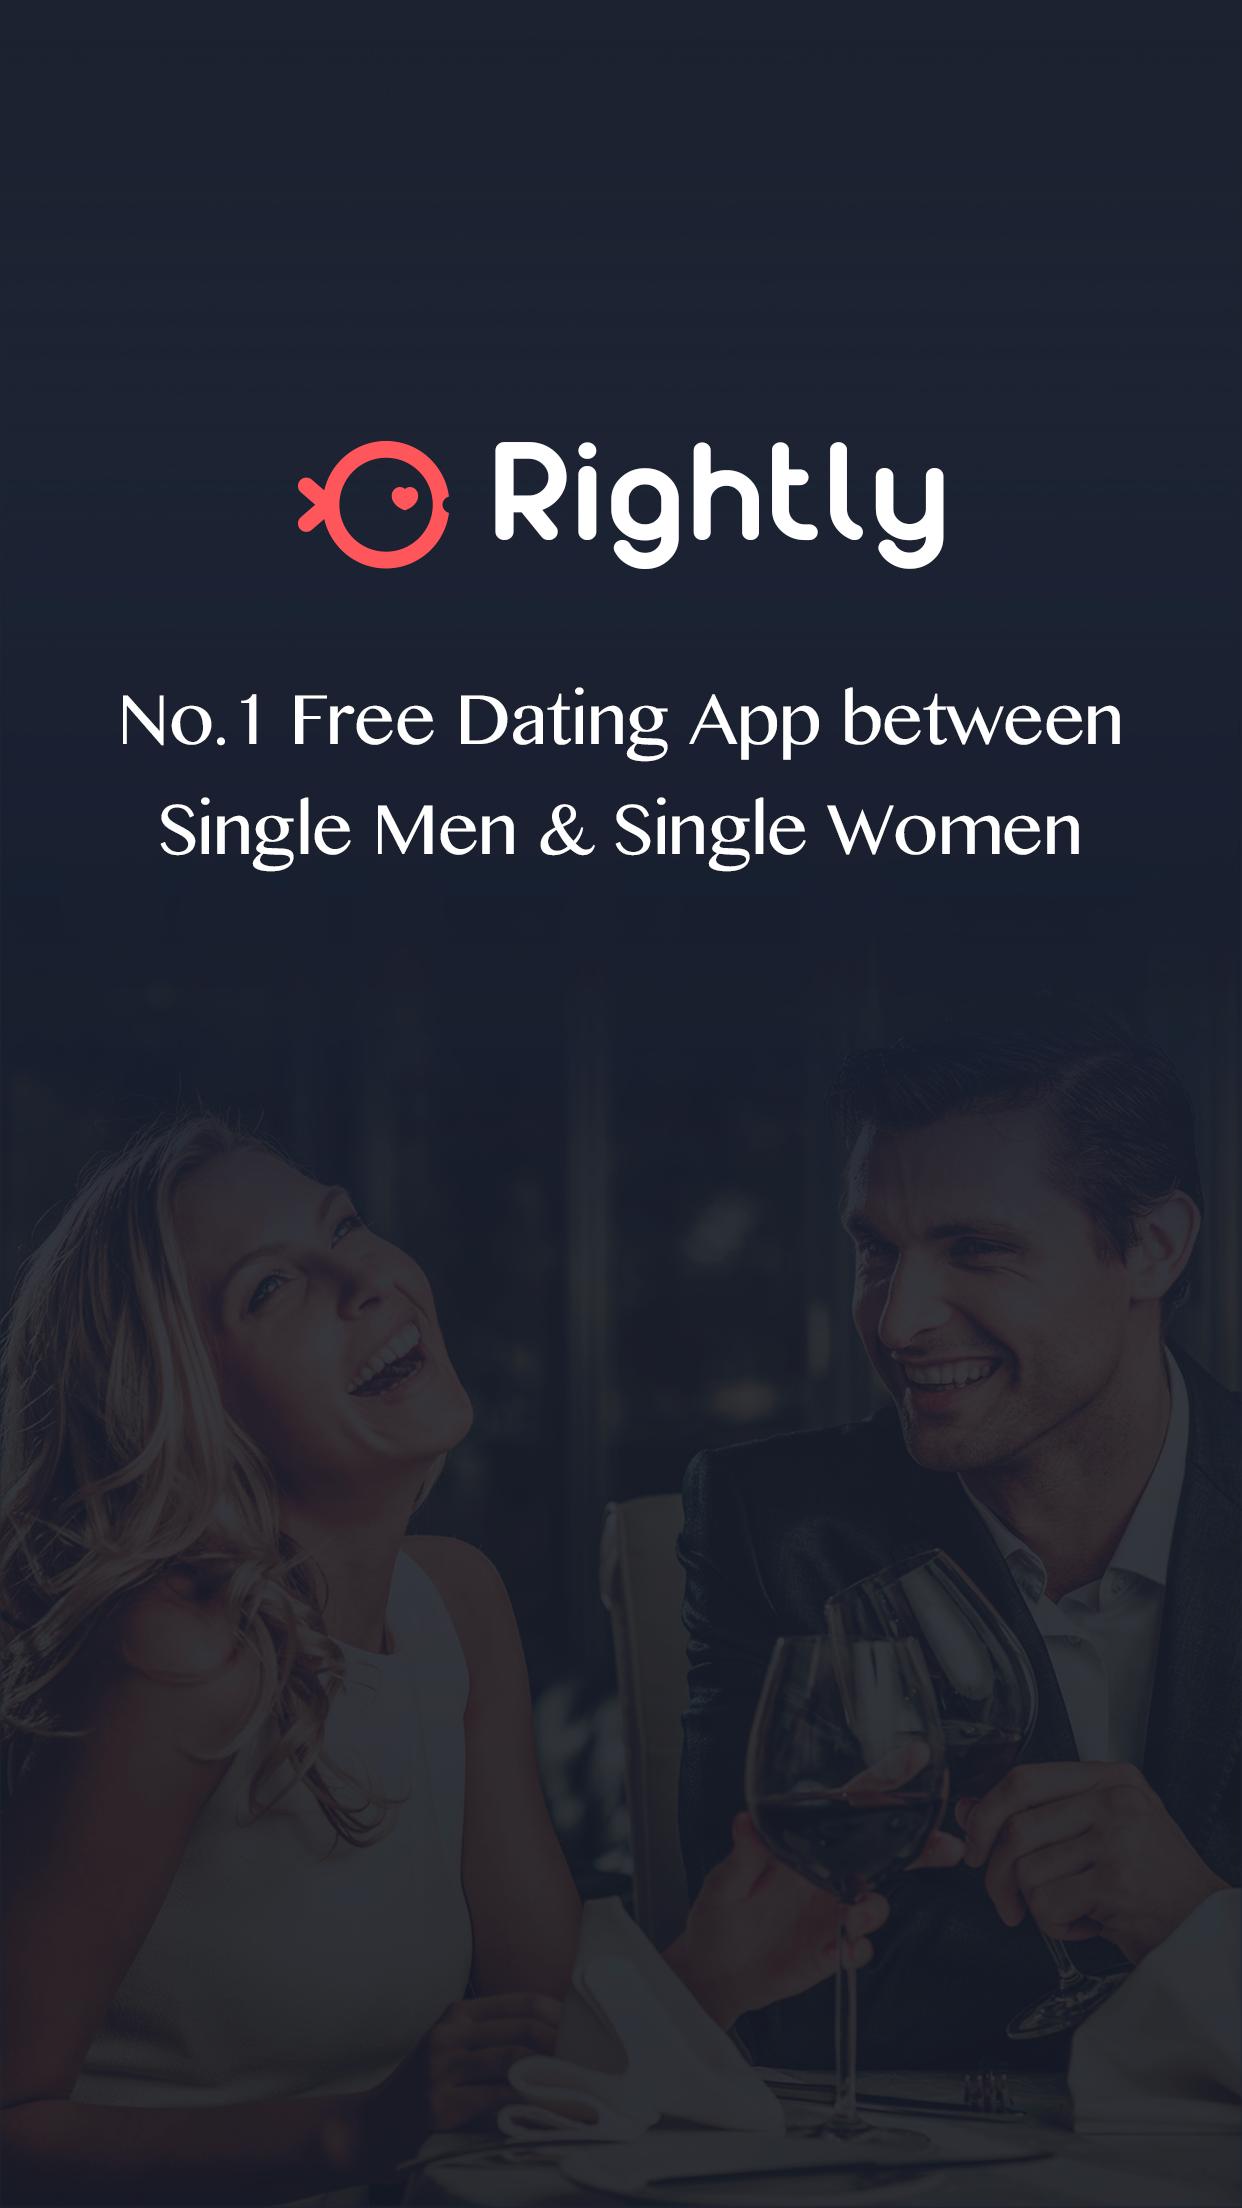 Grindr for straight singles